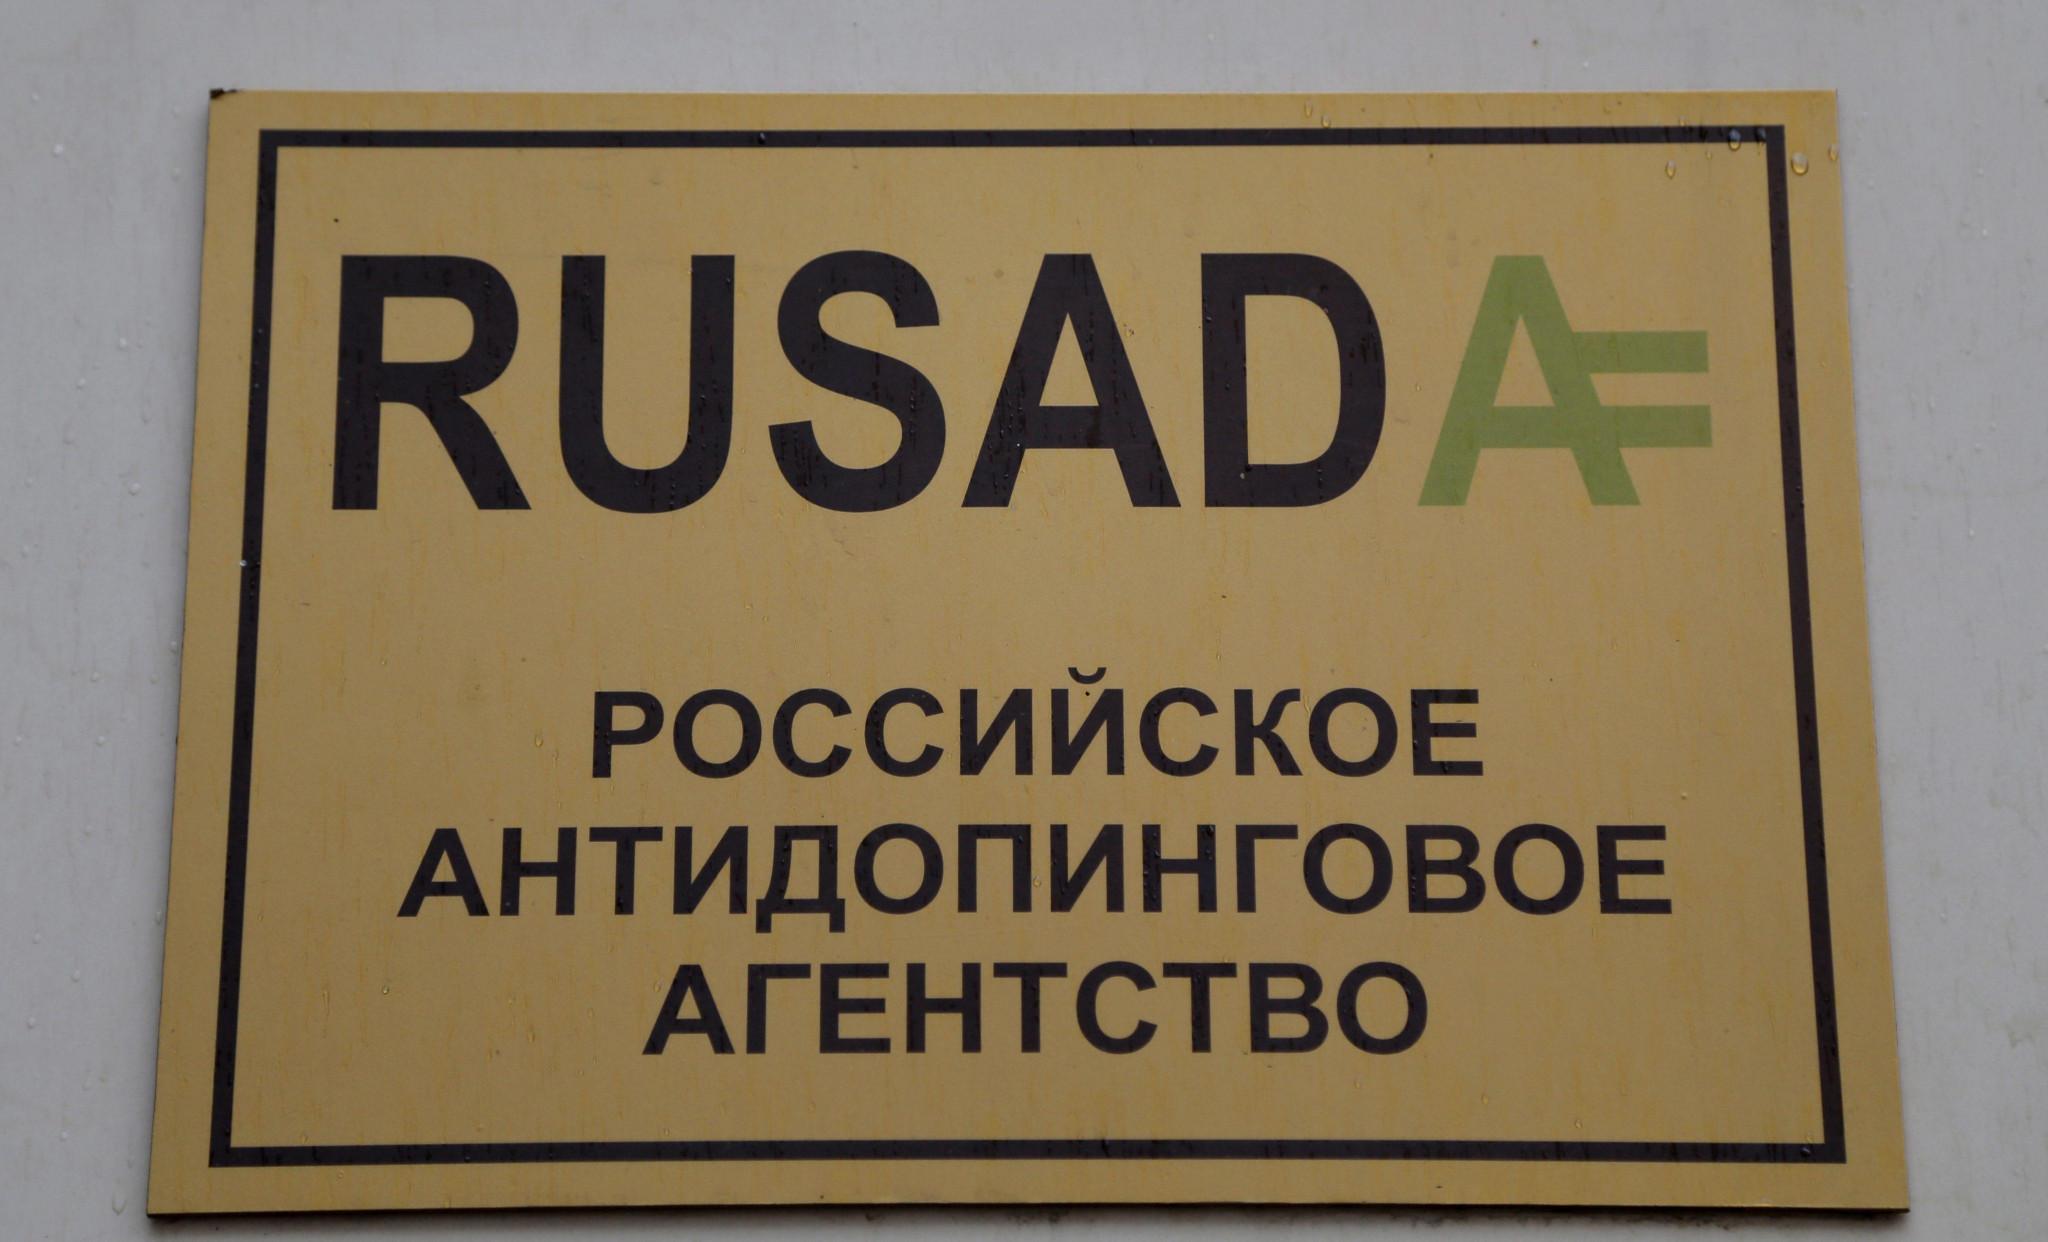 RUSADA is set to be reinstated next week ©RUSADA